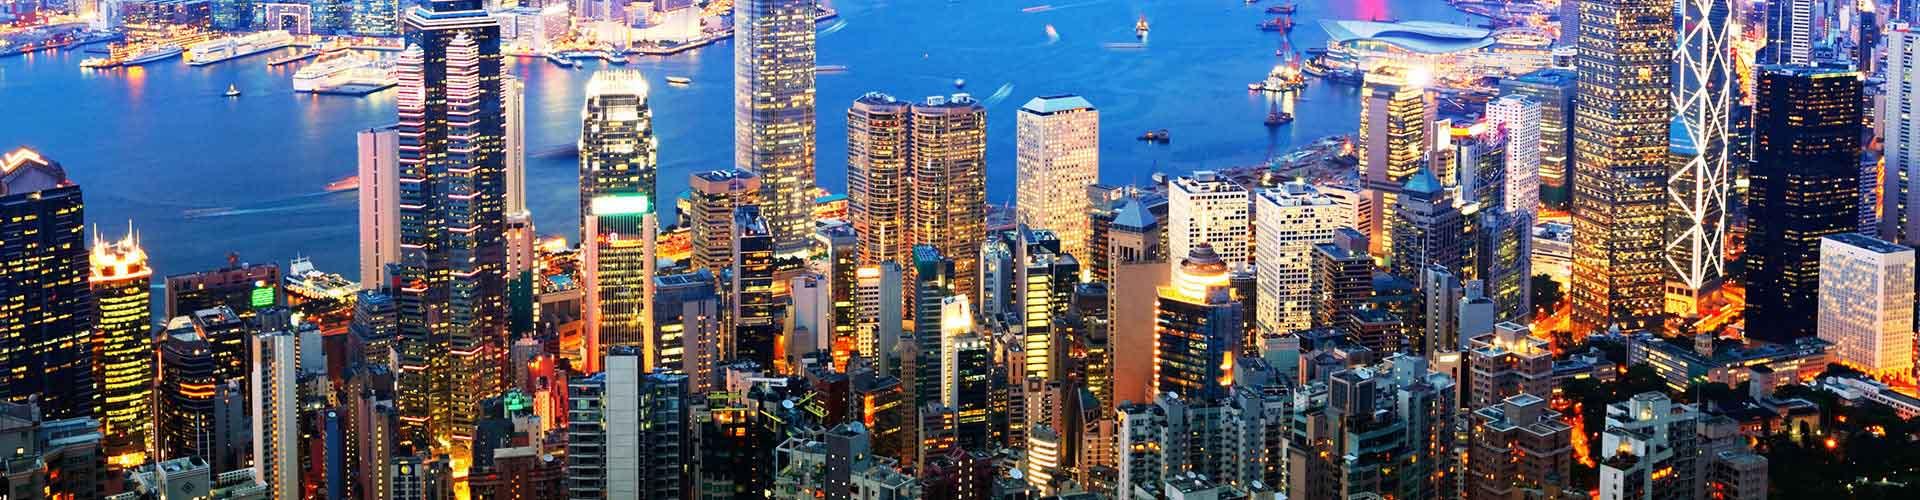 Hong Kong – Appartamenti a Hong Kong. Mappe per Hong Kong, Foto e  Recensioni per ogni Appartamento a Hong Kong.